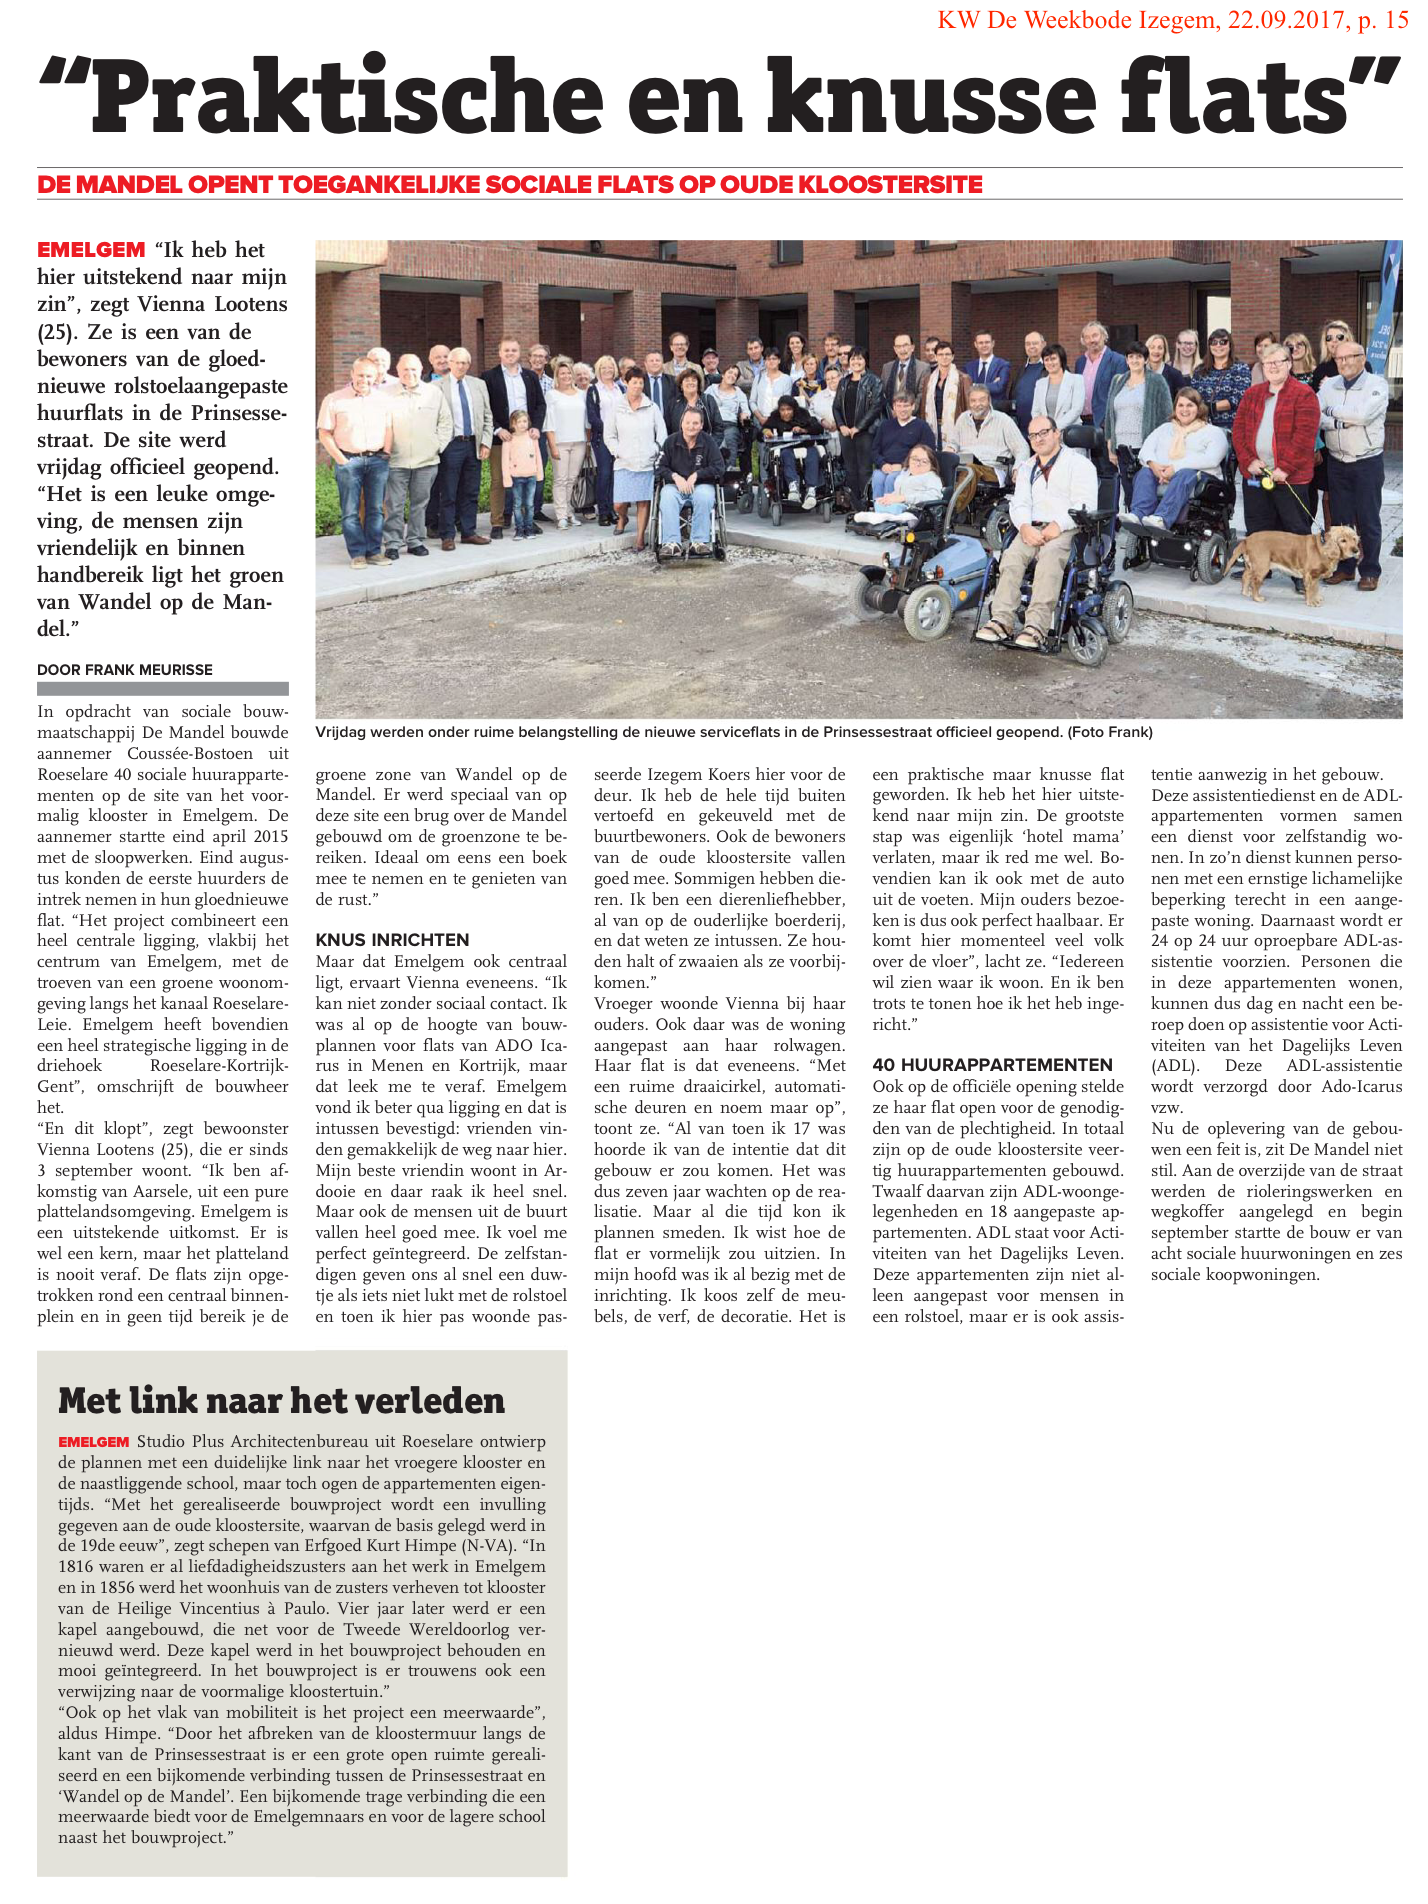 KW De Weekbode Izegem, 22.09.2017, p. 15